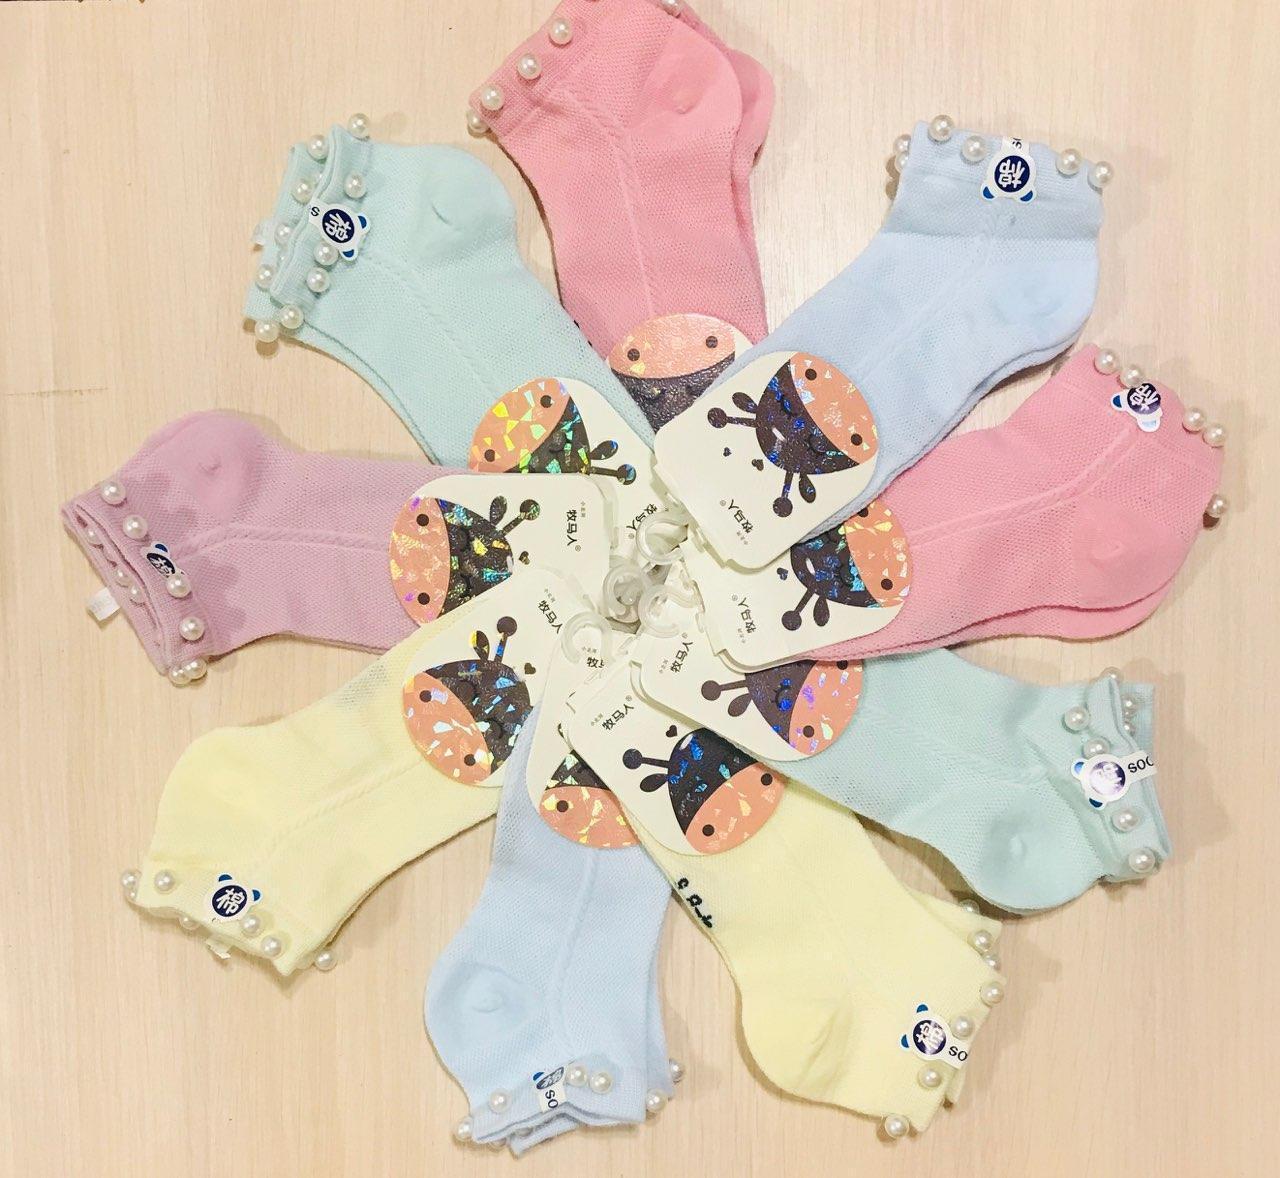 Носки детские летние с сеткой хлопок с жемчугом Happy Baby размер 8-12 года